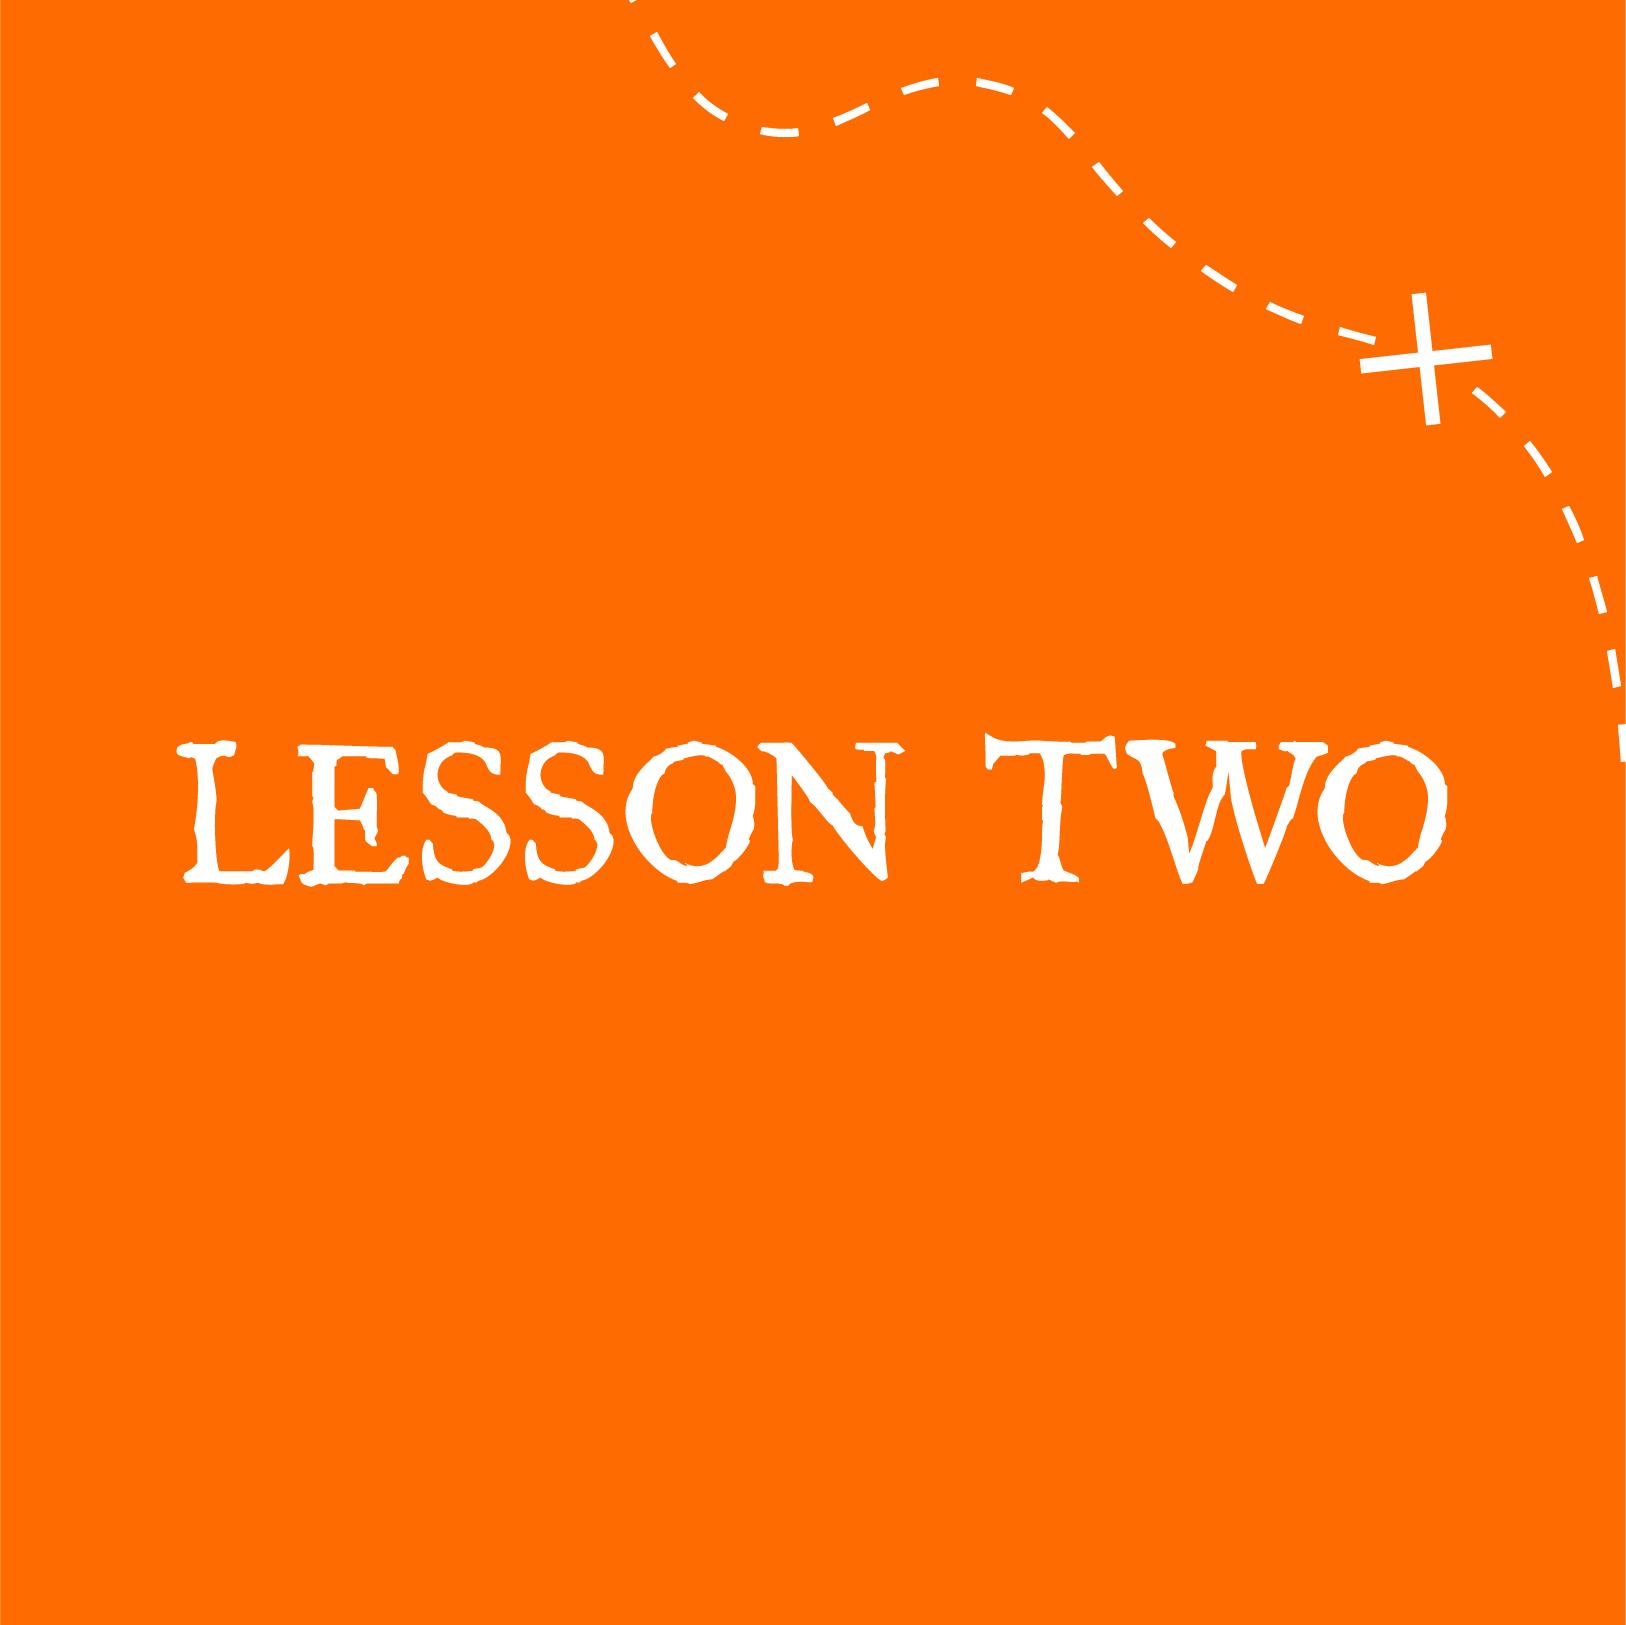 VBS Lesson 2